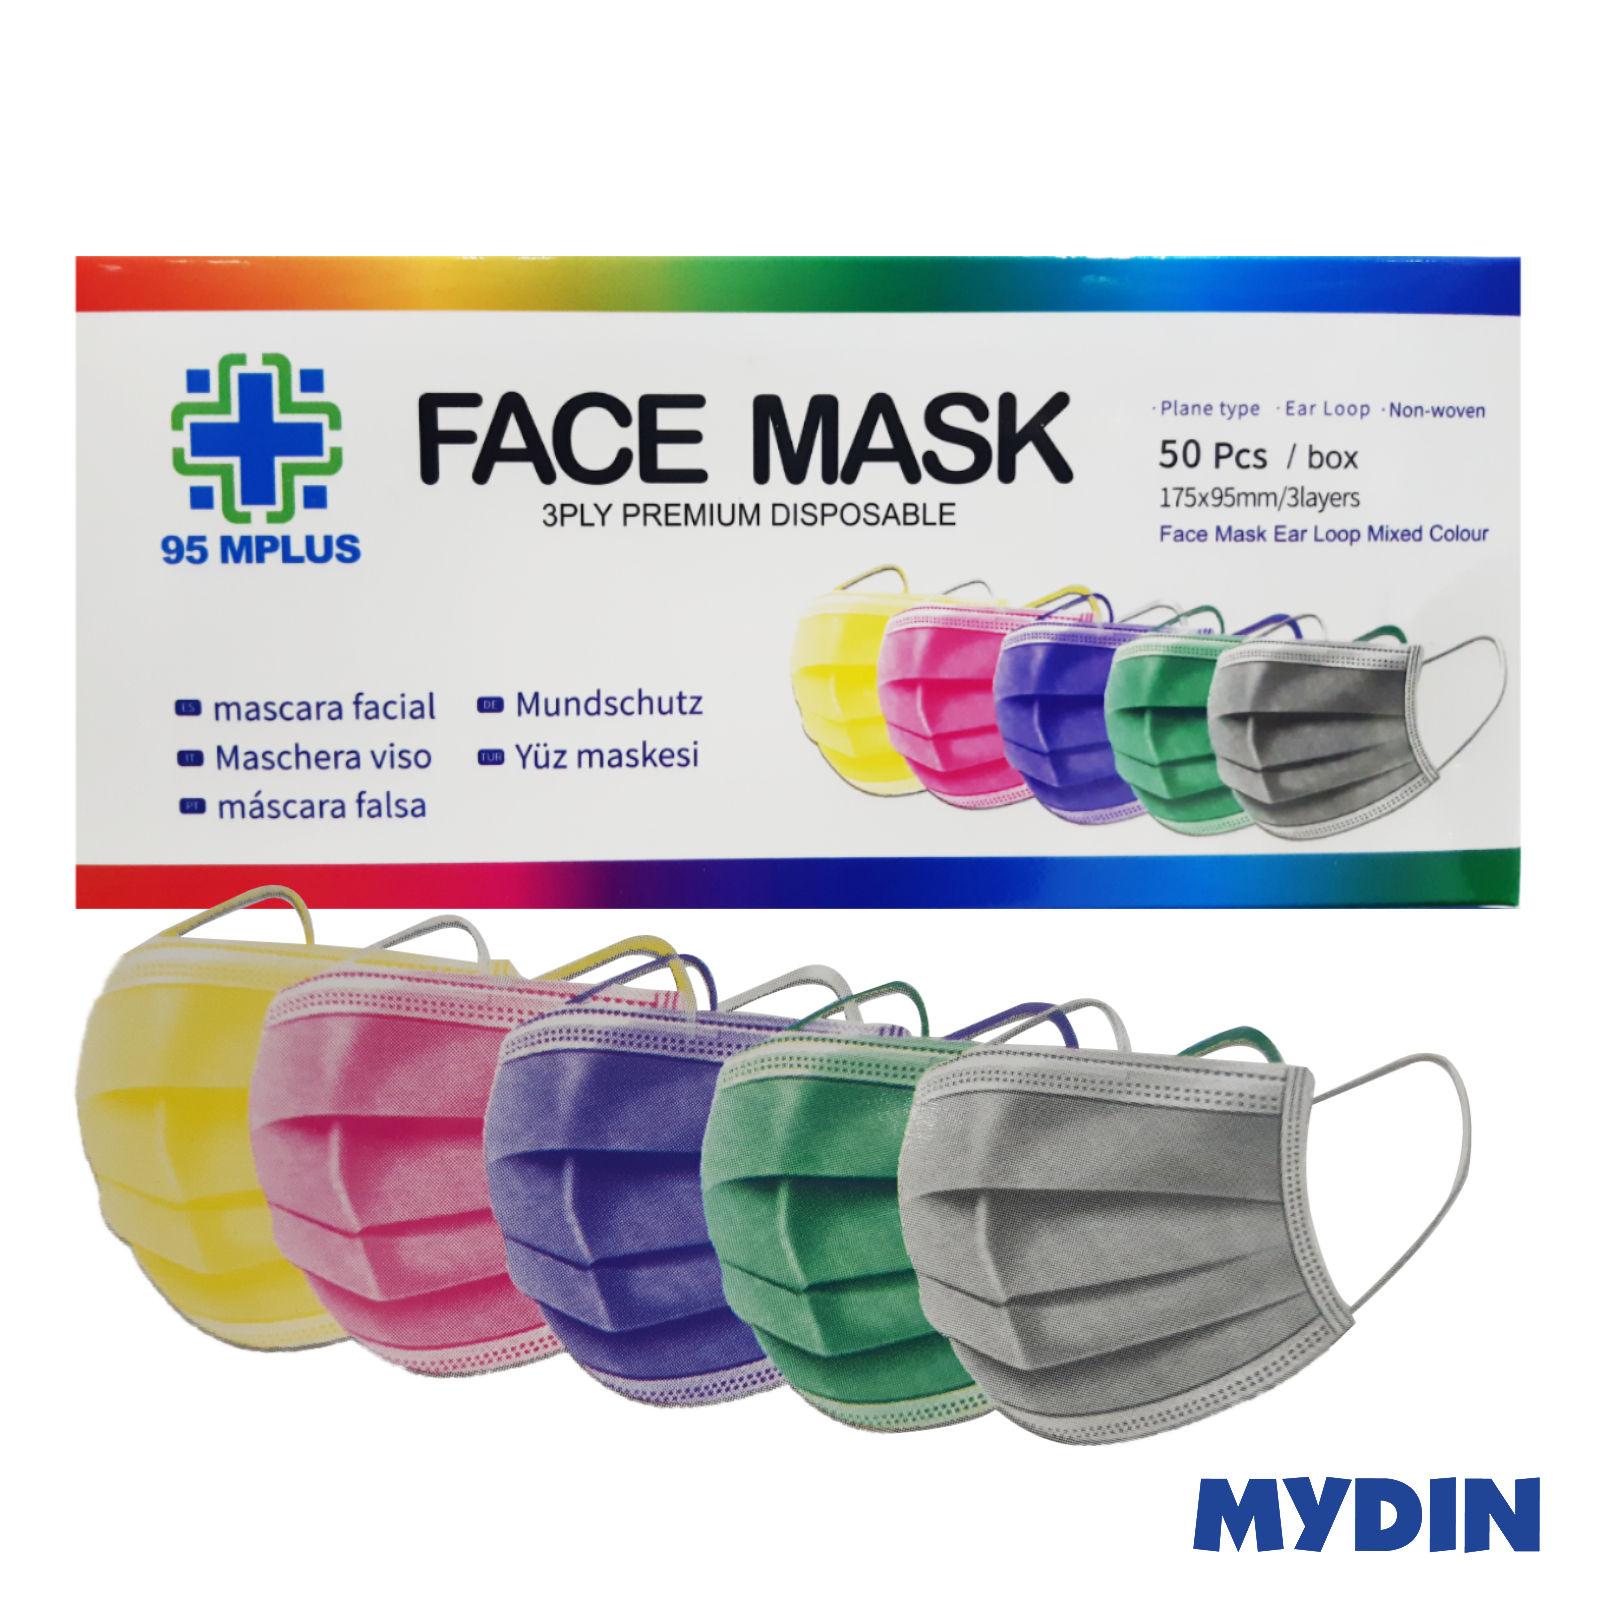 3-Ply Disposable Adult Face Mask Ear Loop Mix Colours (50Pcs)